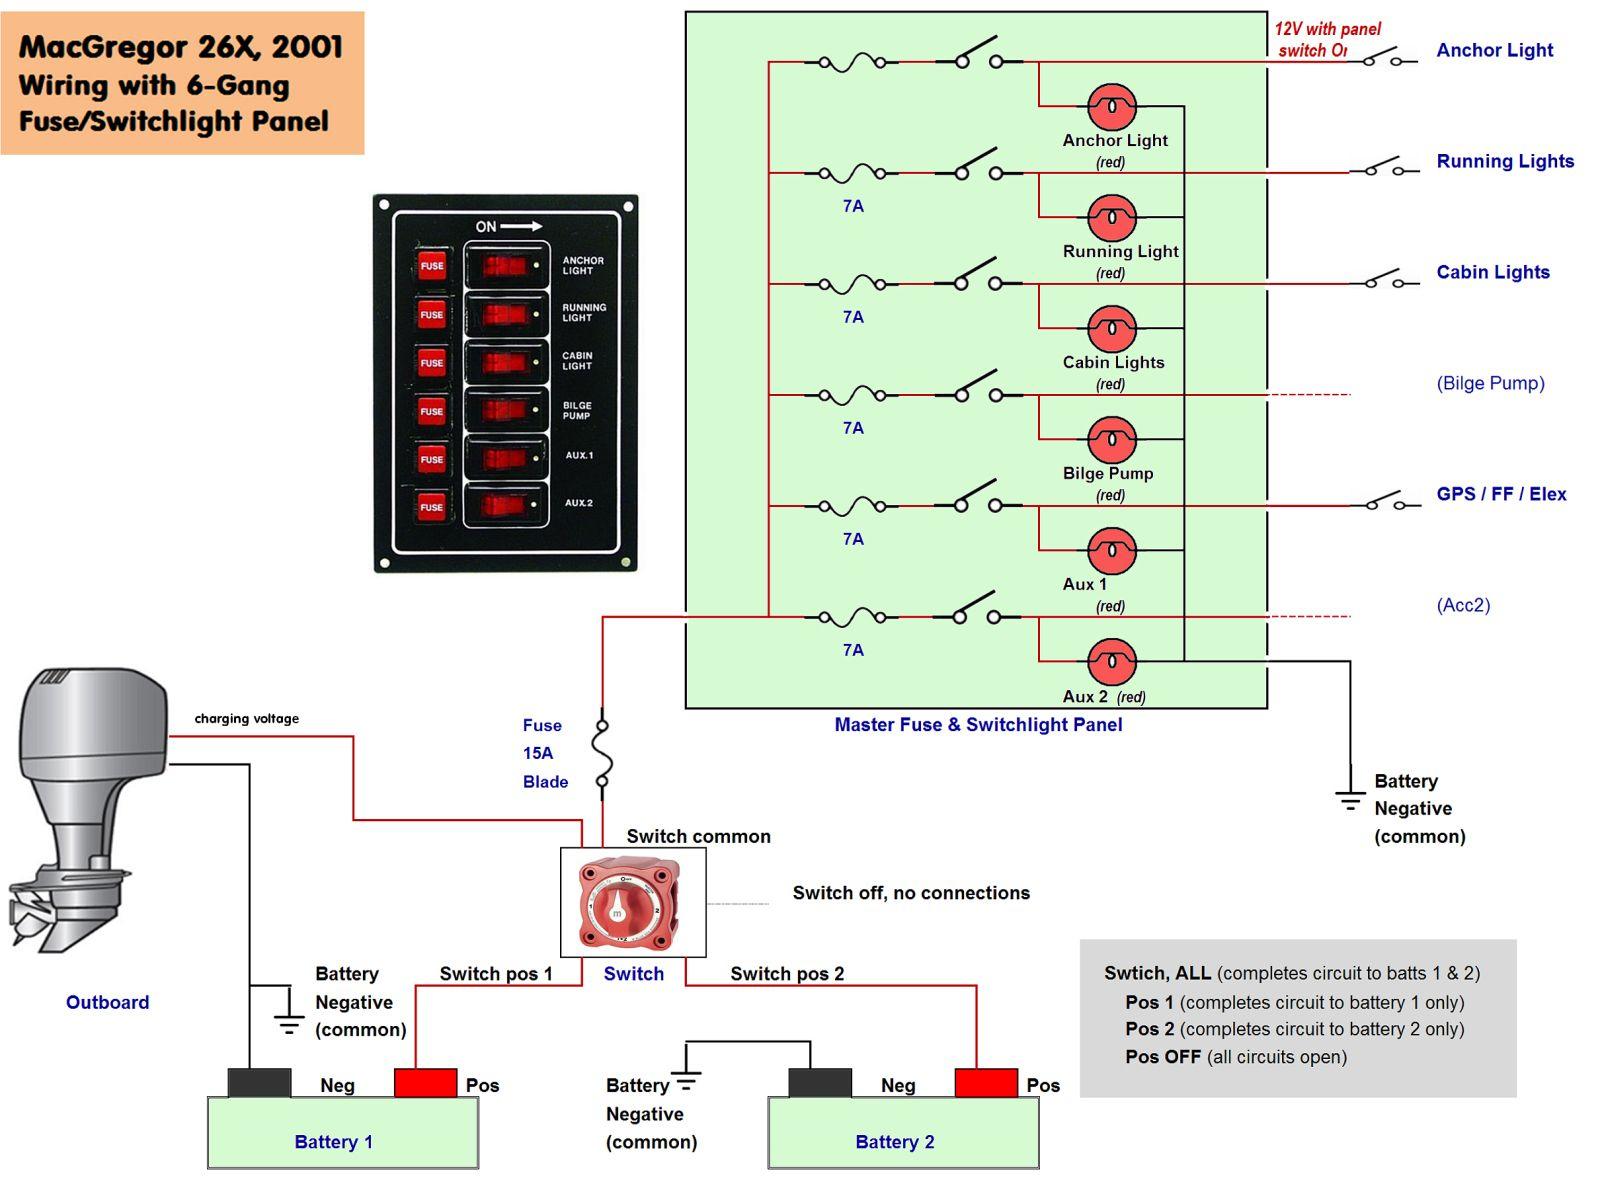 Boat Wiring Fuse Panel Diagram - Wiring Diagram Detailed - Boat Fuse Panel Wiring Diagram